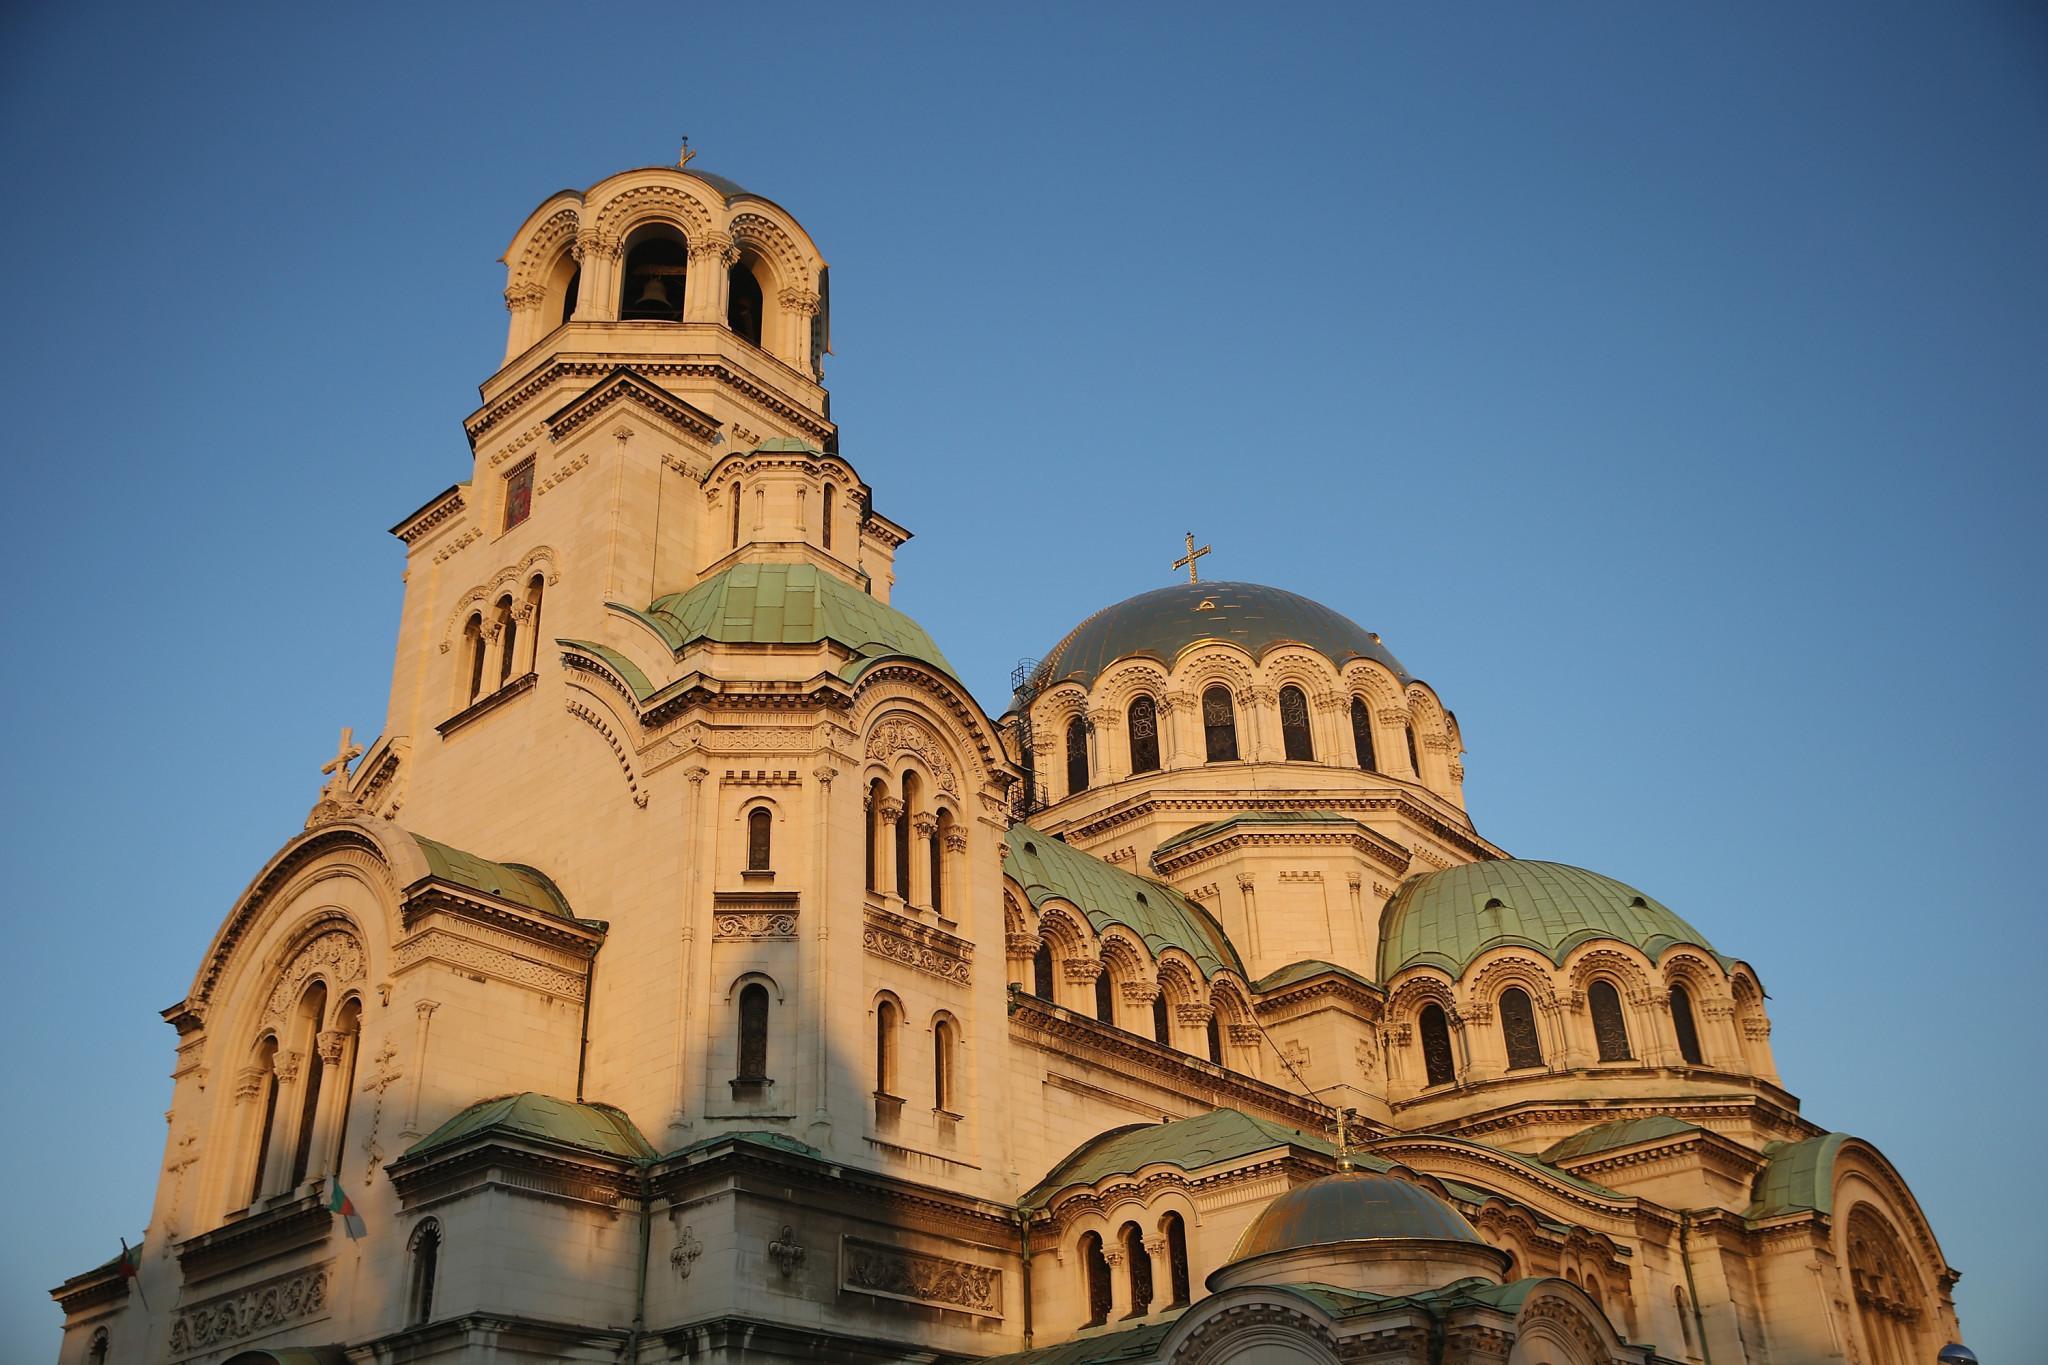 Sofia, Bulgaria. ©Sean Gallup/Getty Images